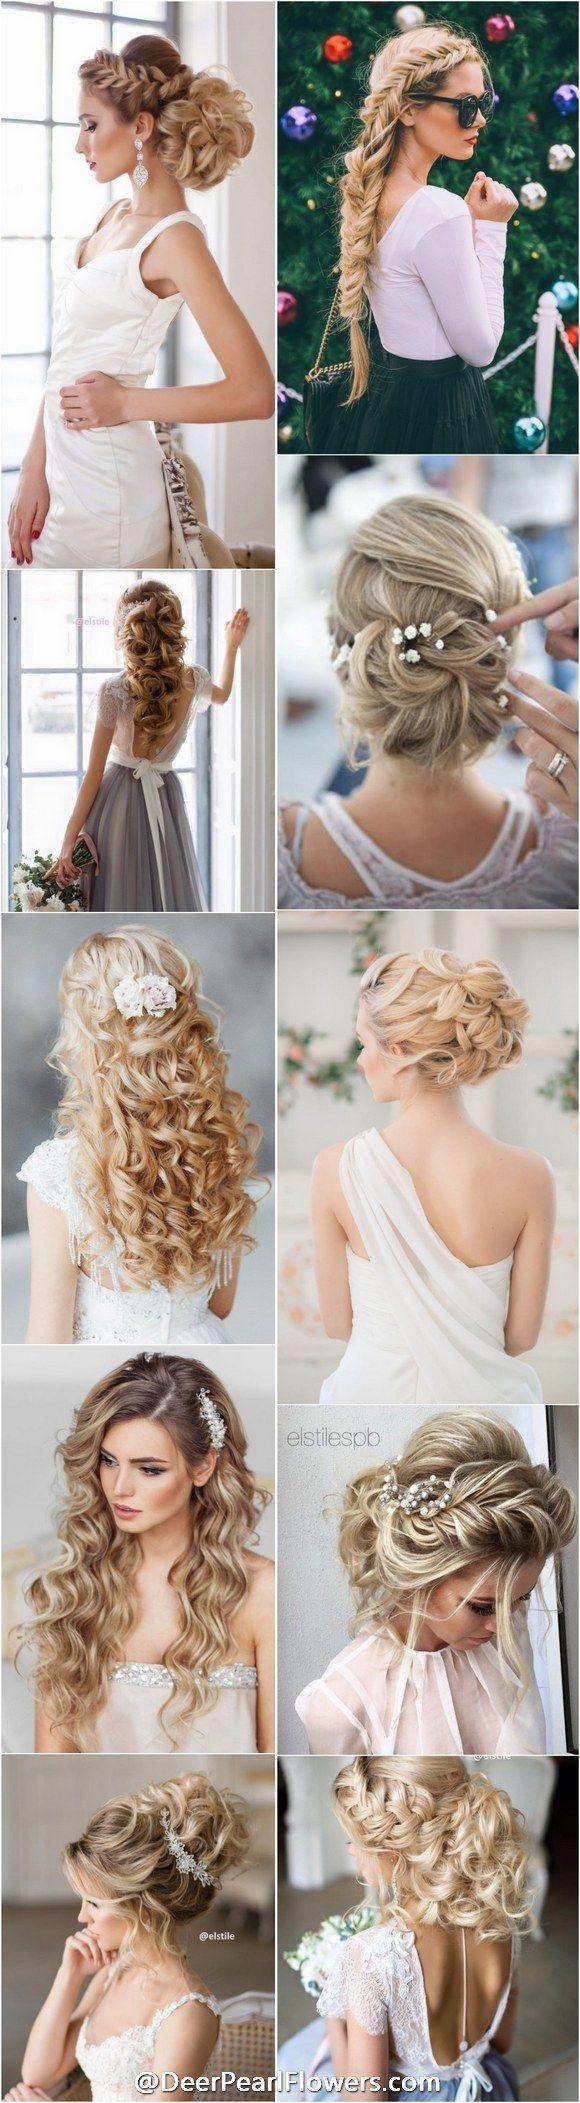 chic wedding hair updos for elegant brides wedding weddings